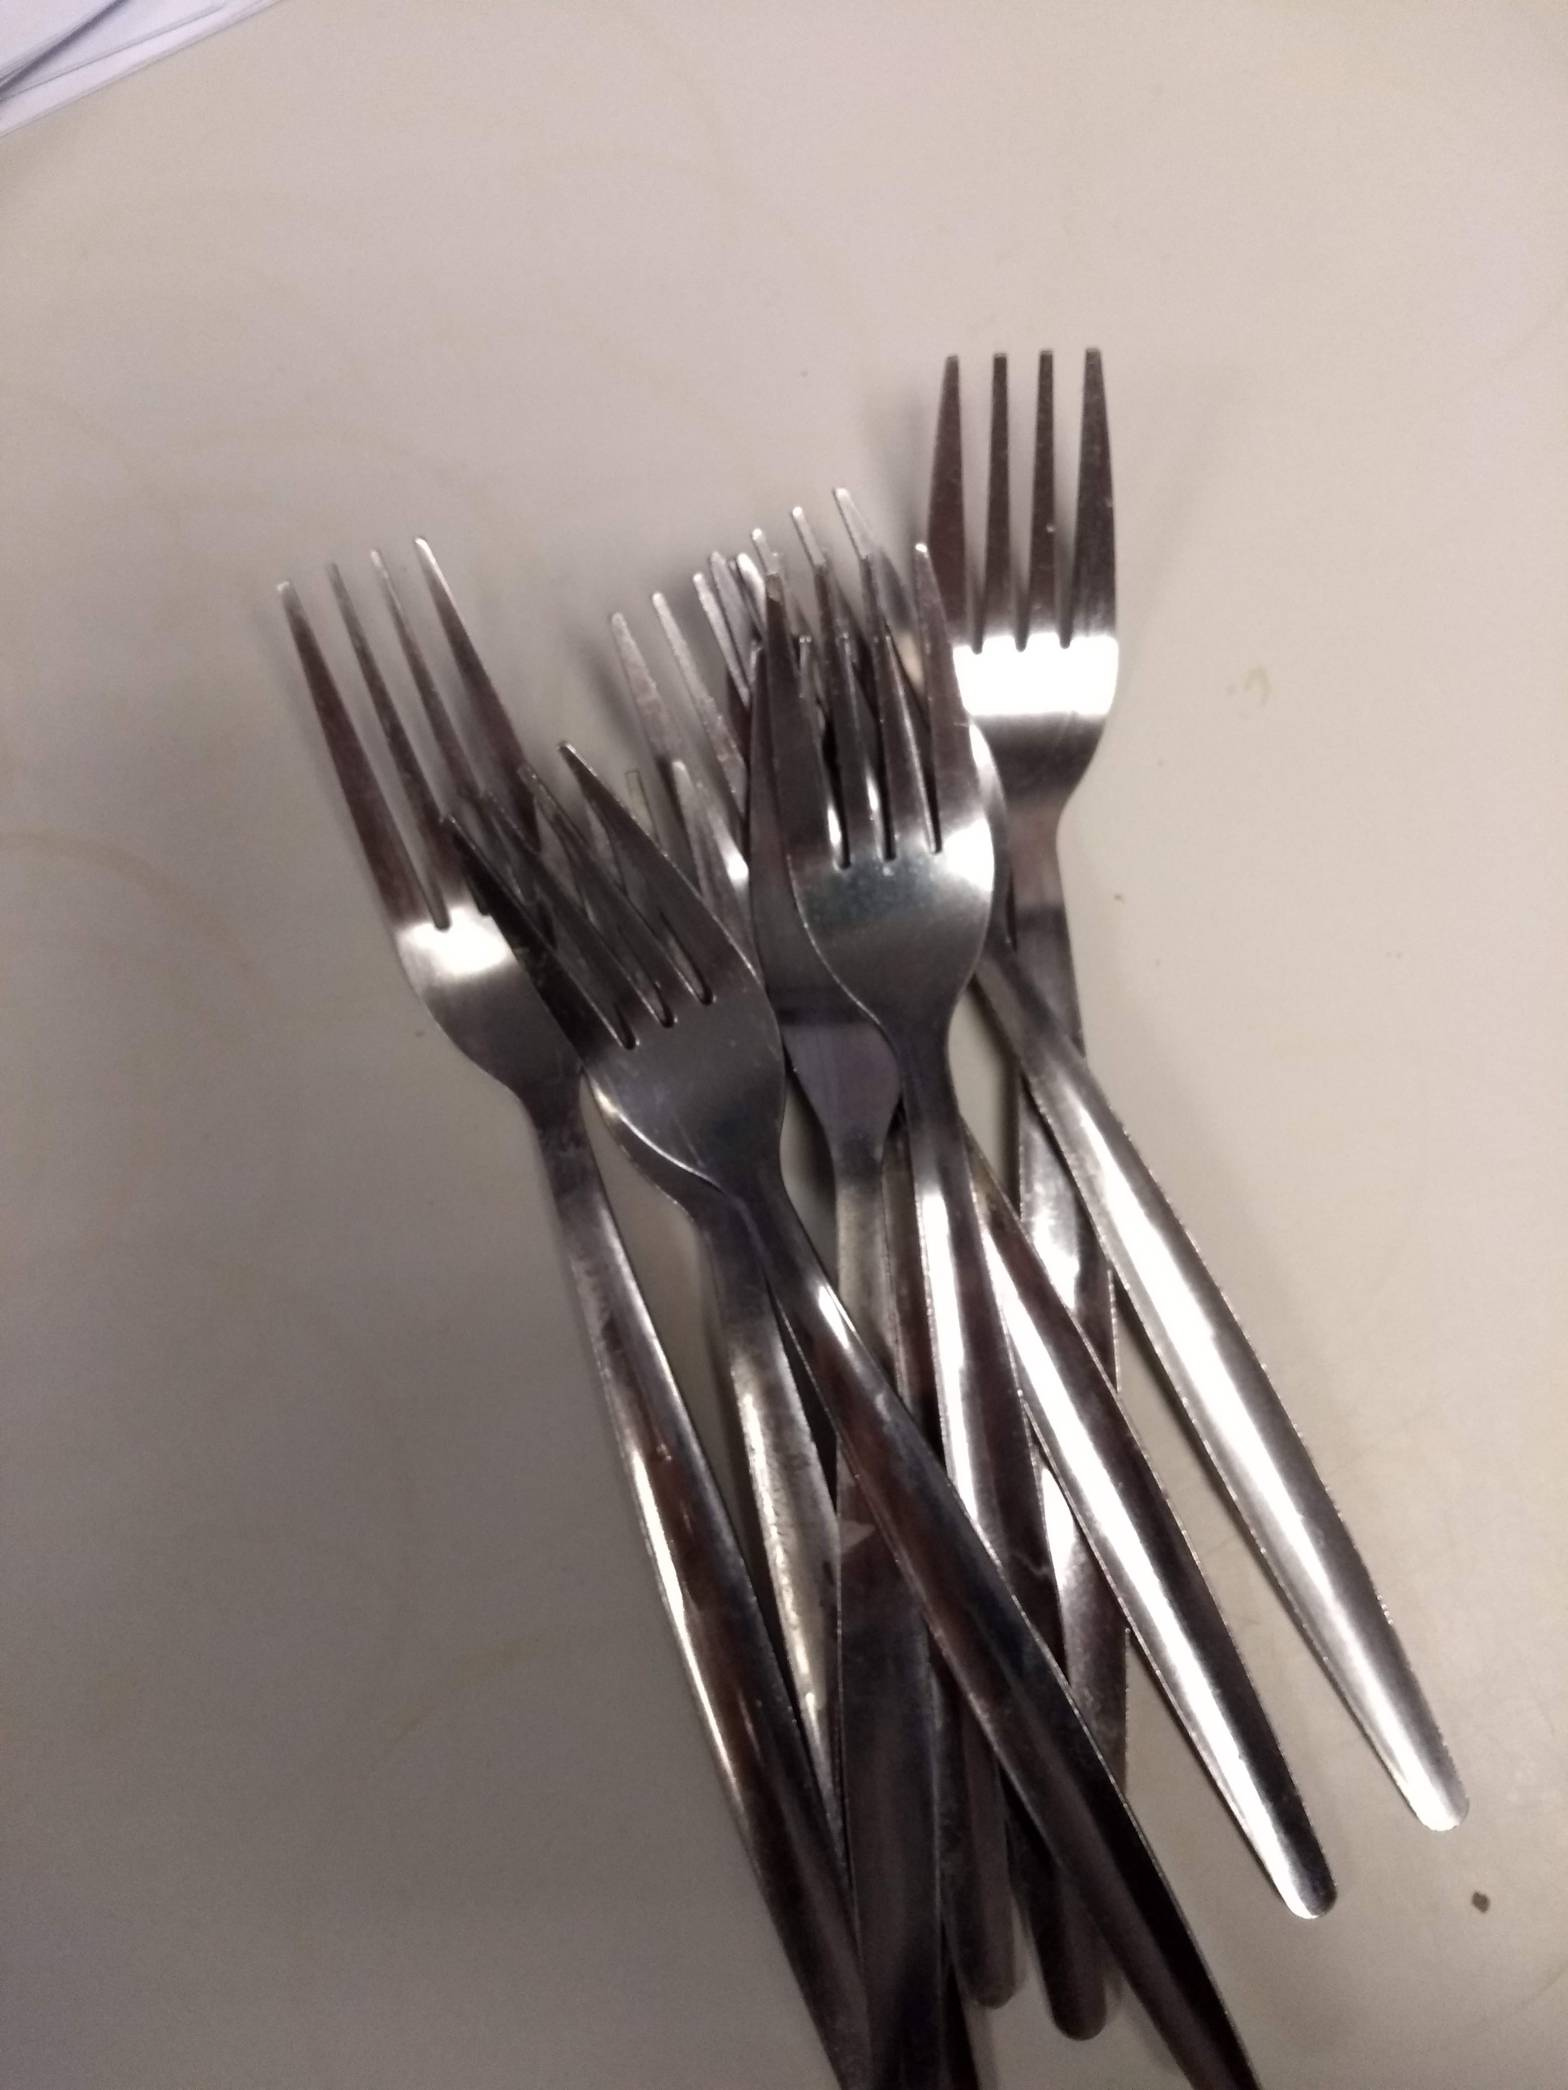 Pile of Forks